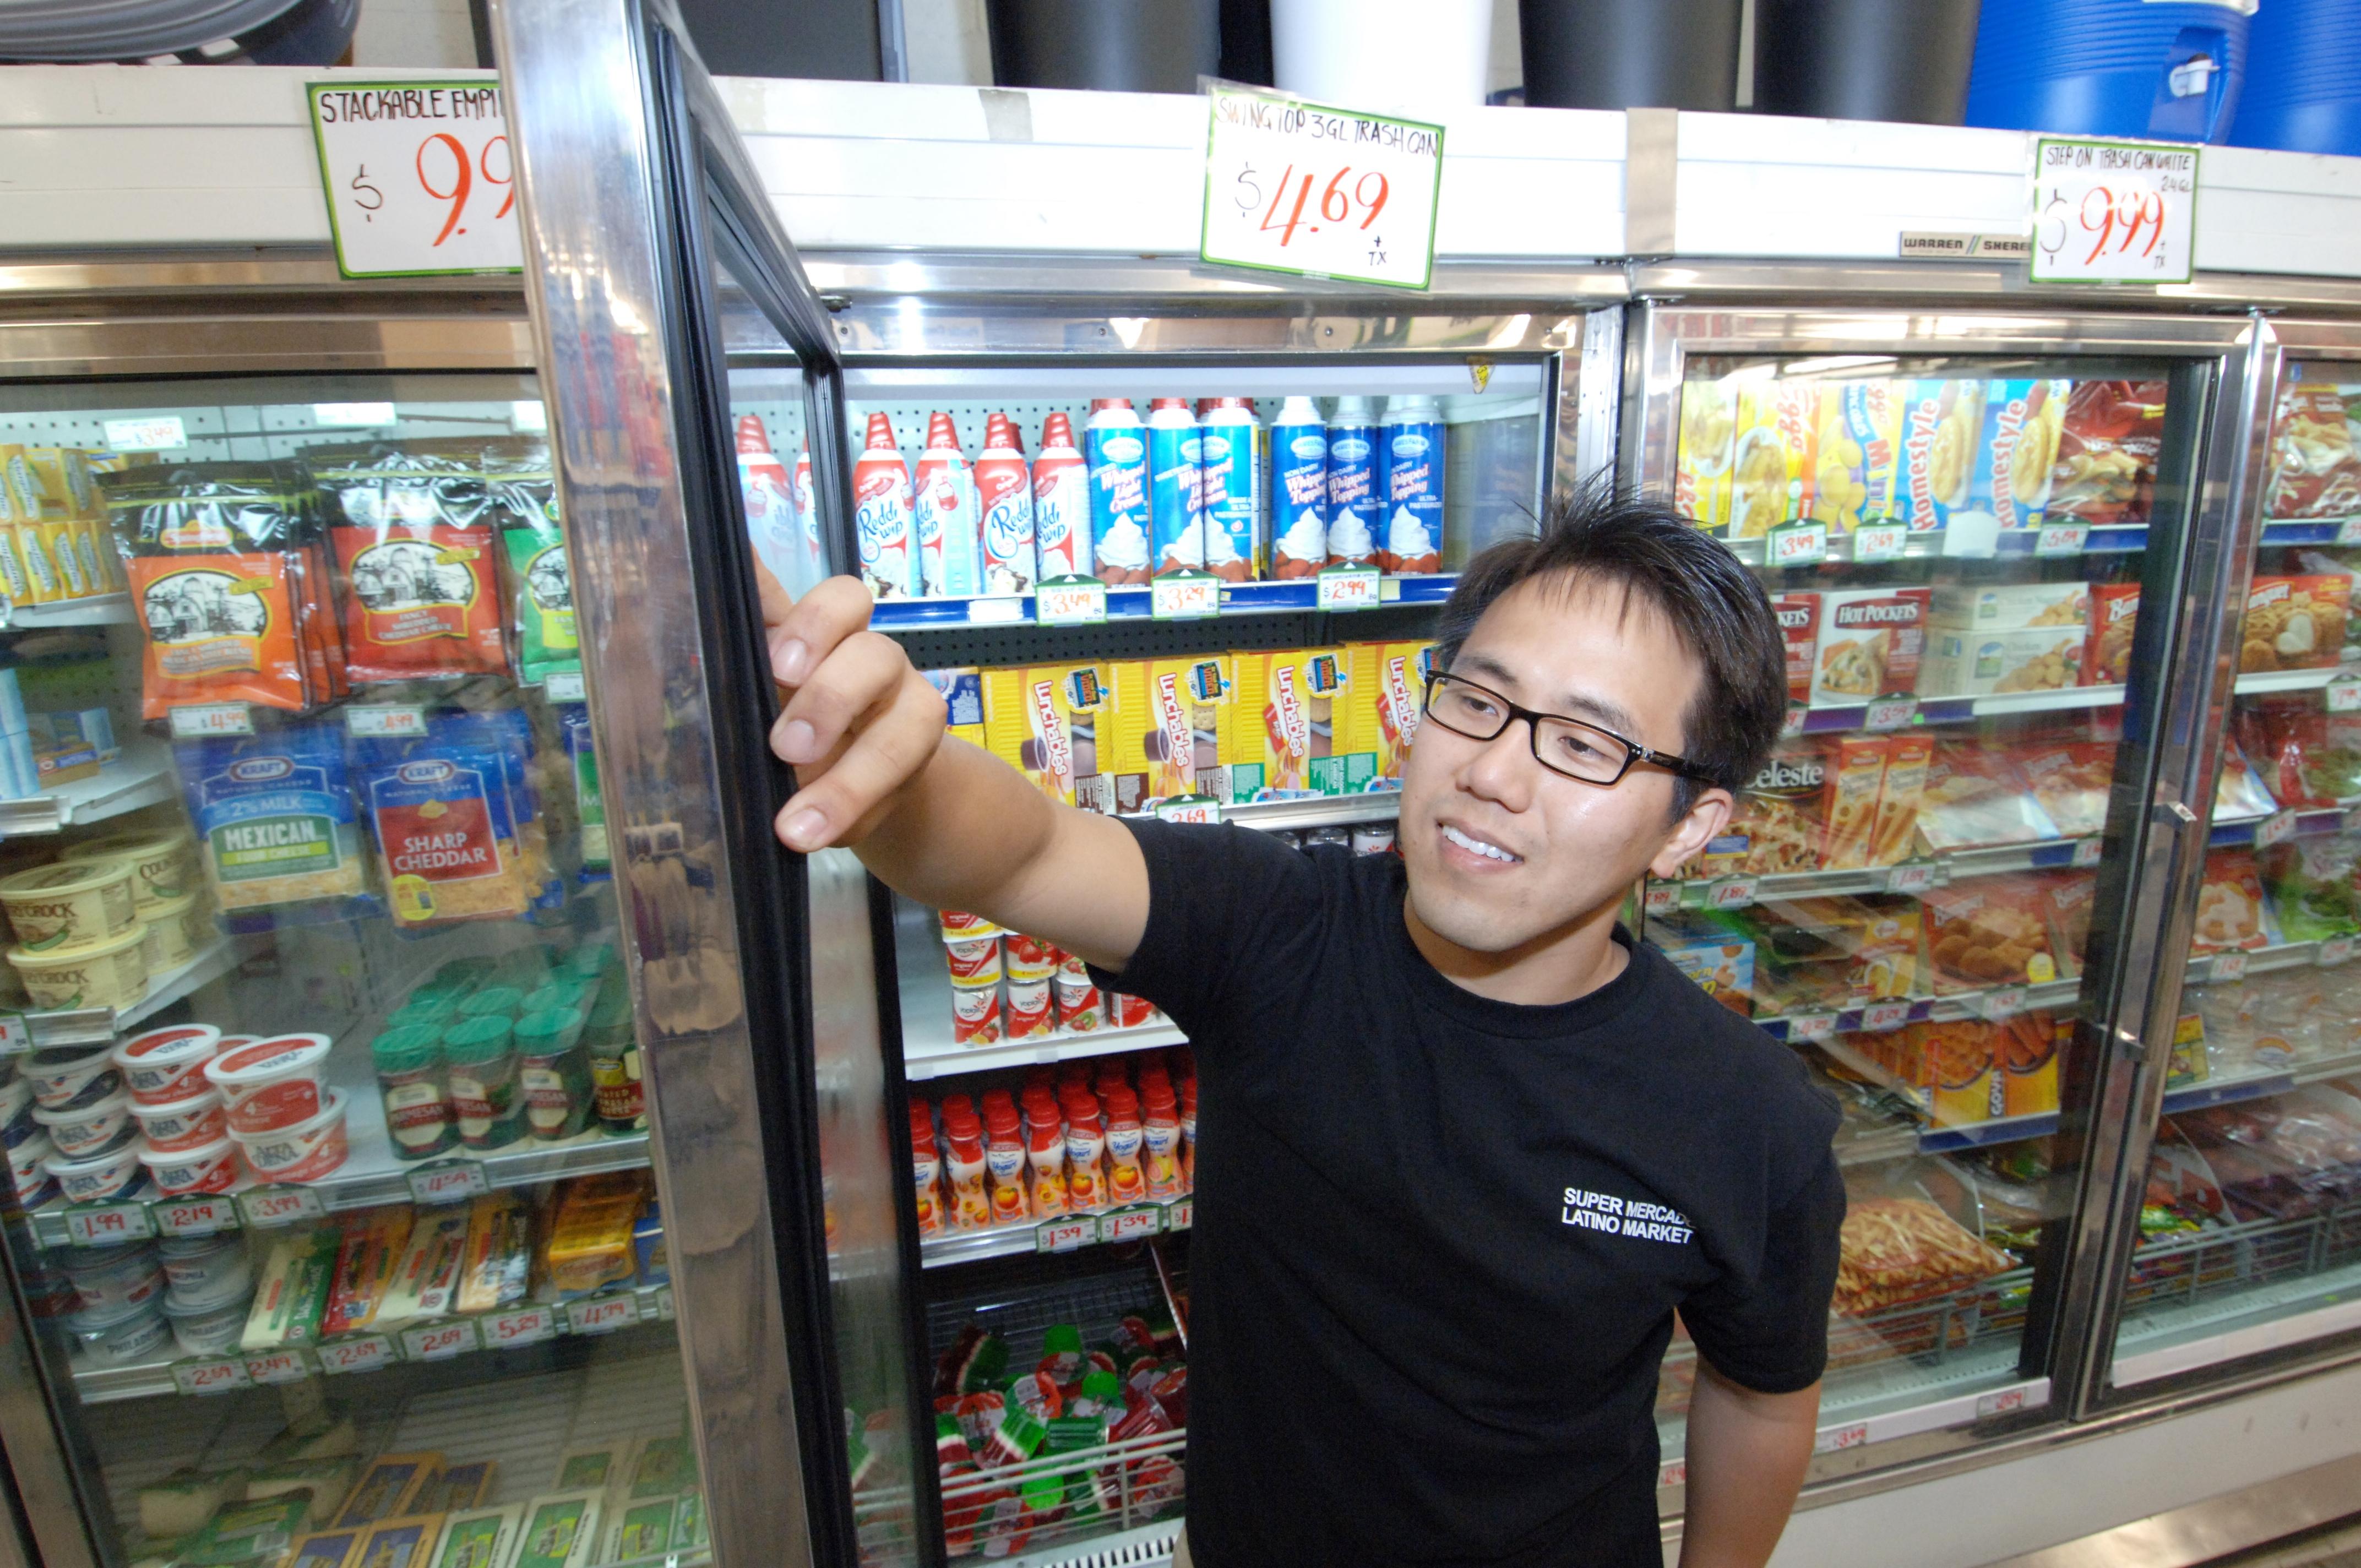 Mercado_refrigeration.JPG